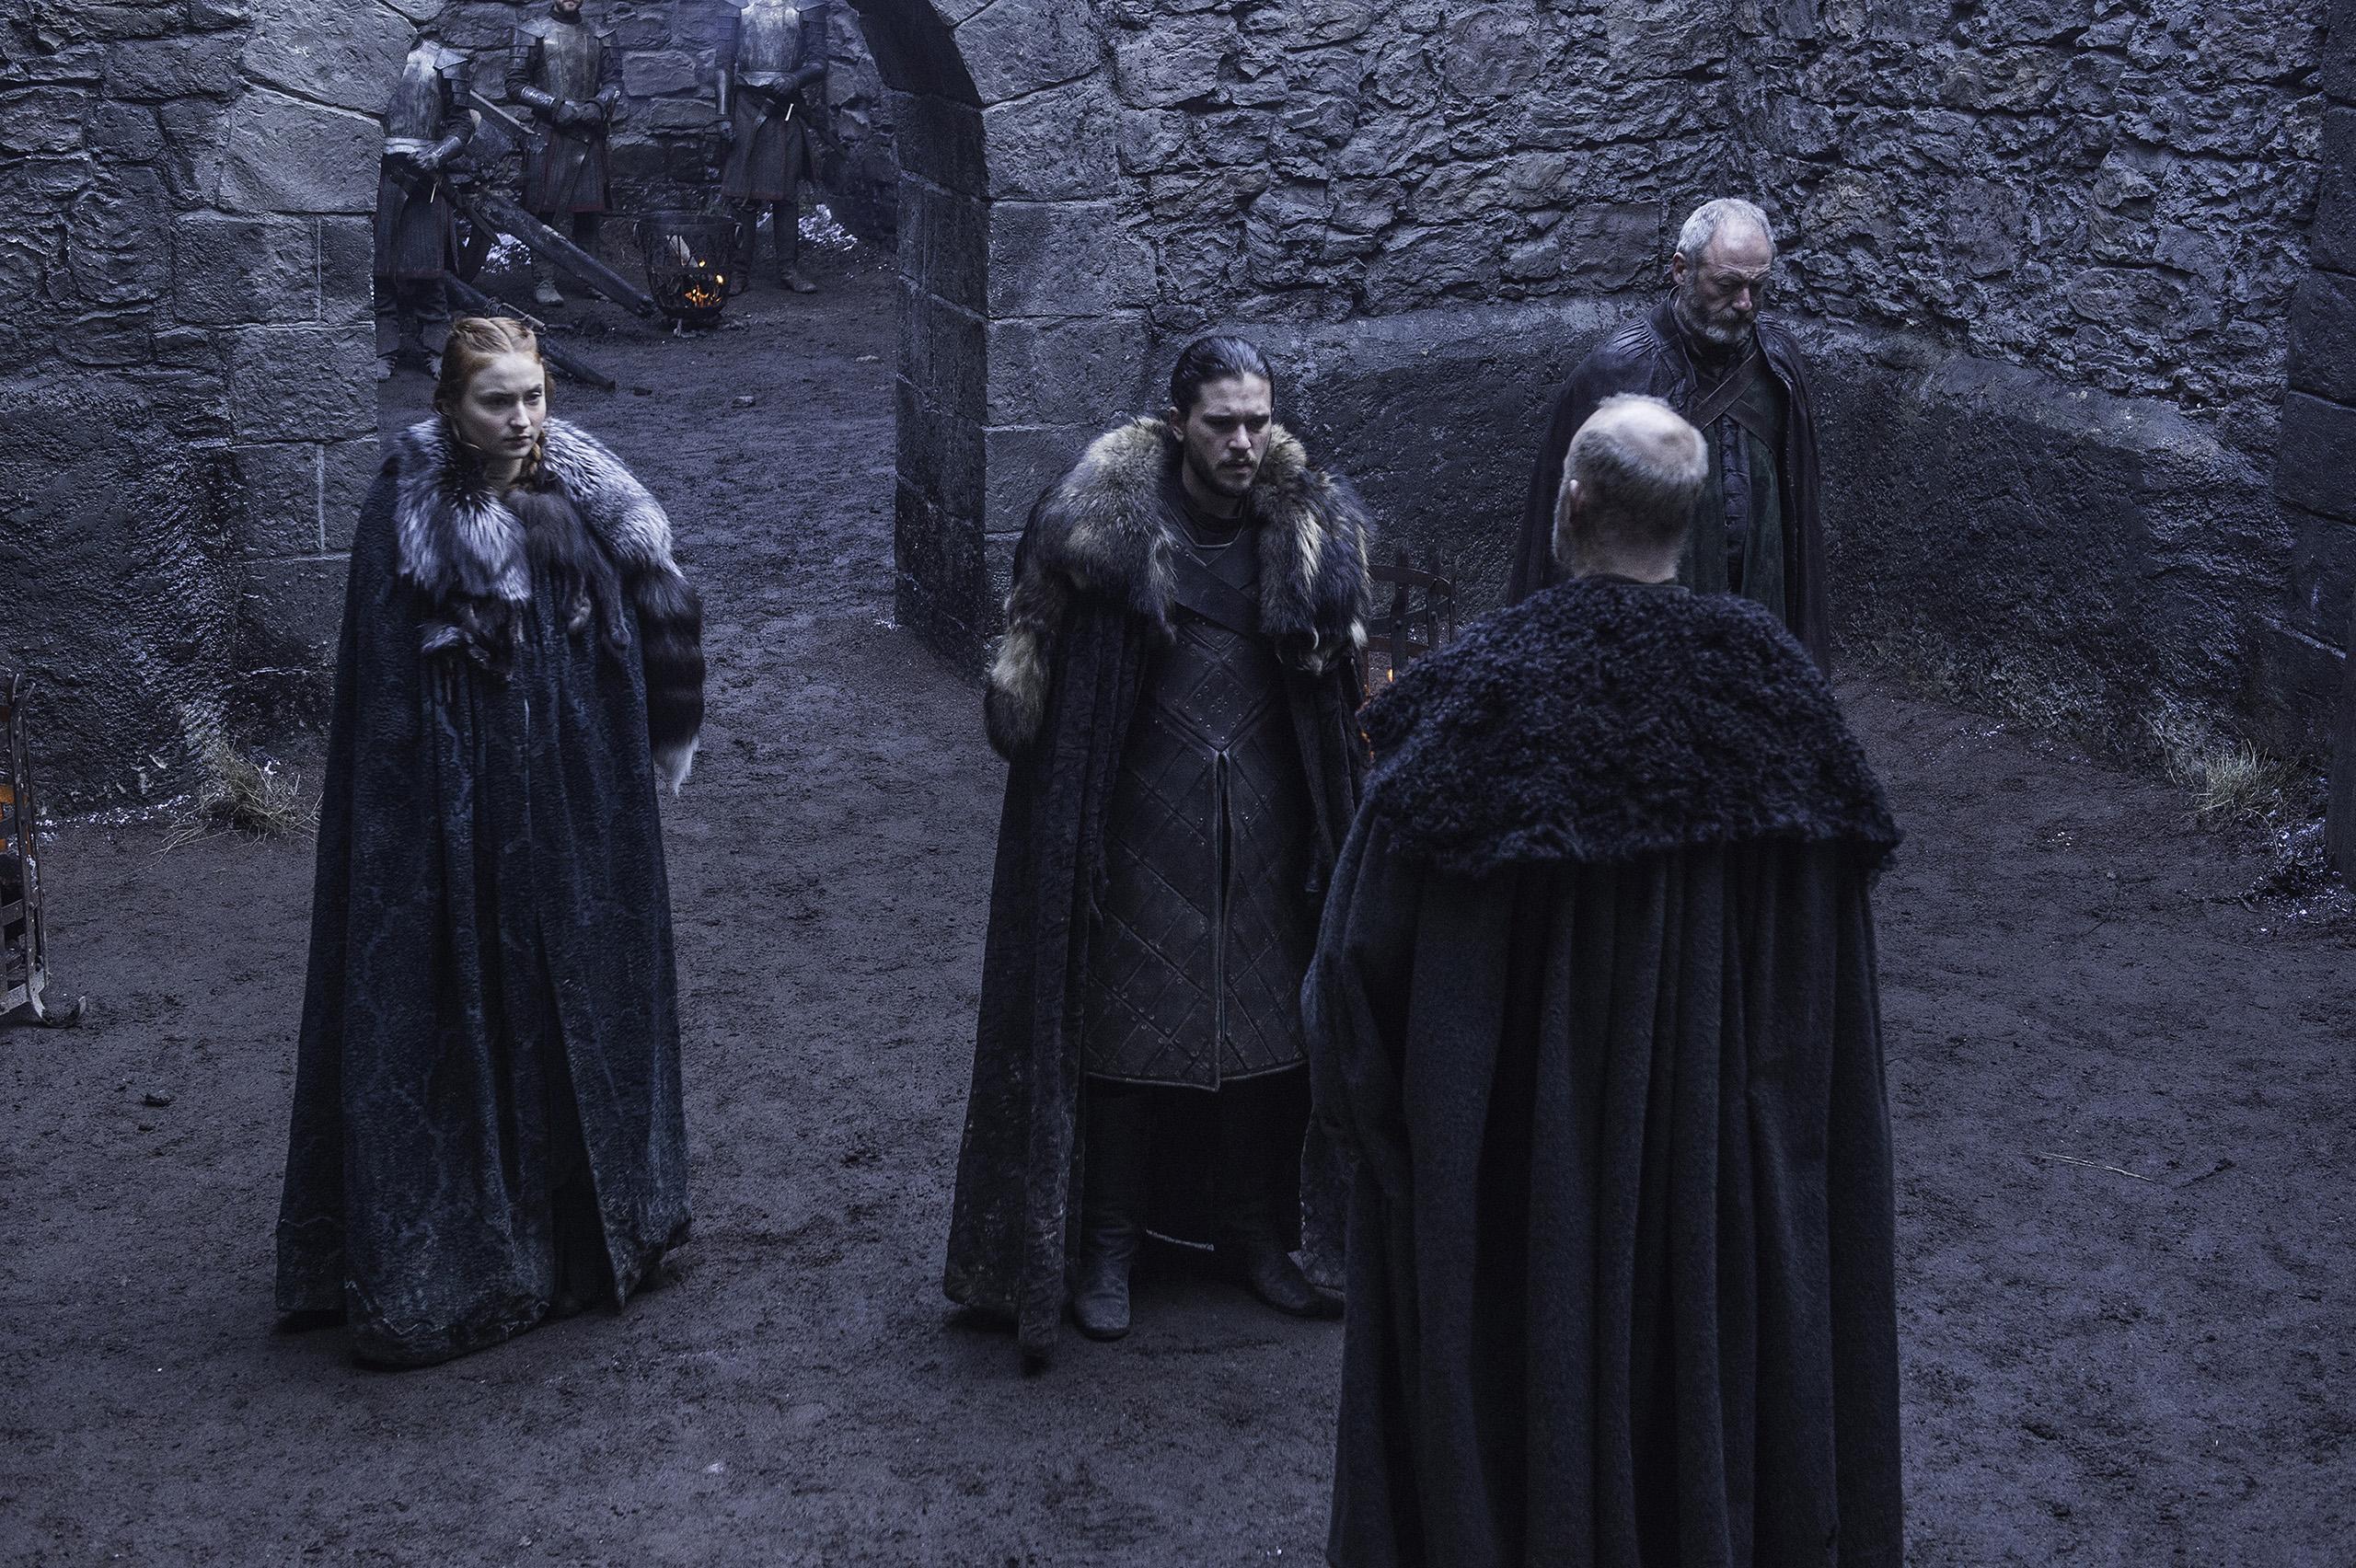 Sophie Turner (Sansa Stark), Kit Harington (Jon Snow), and Tim McInnerny (Robert Glover) in Game of Thrones.